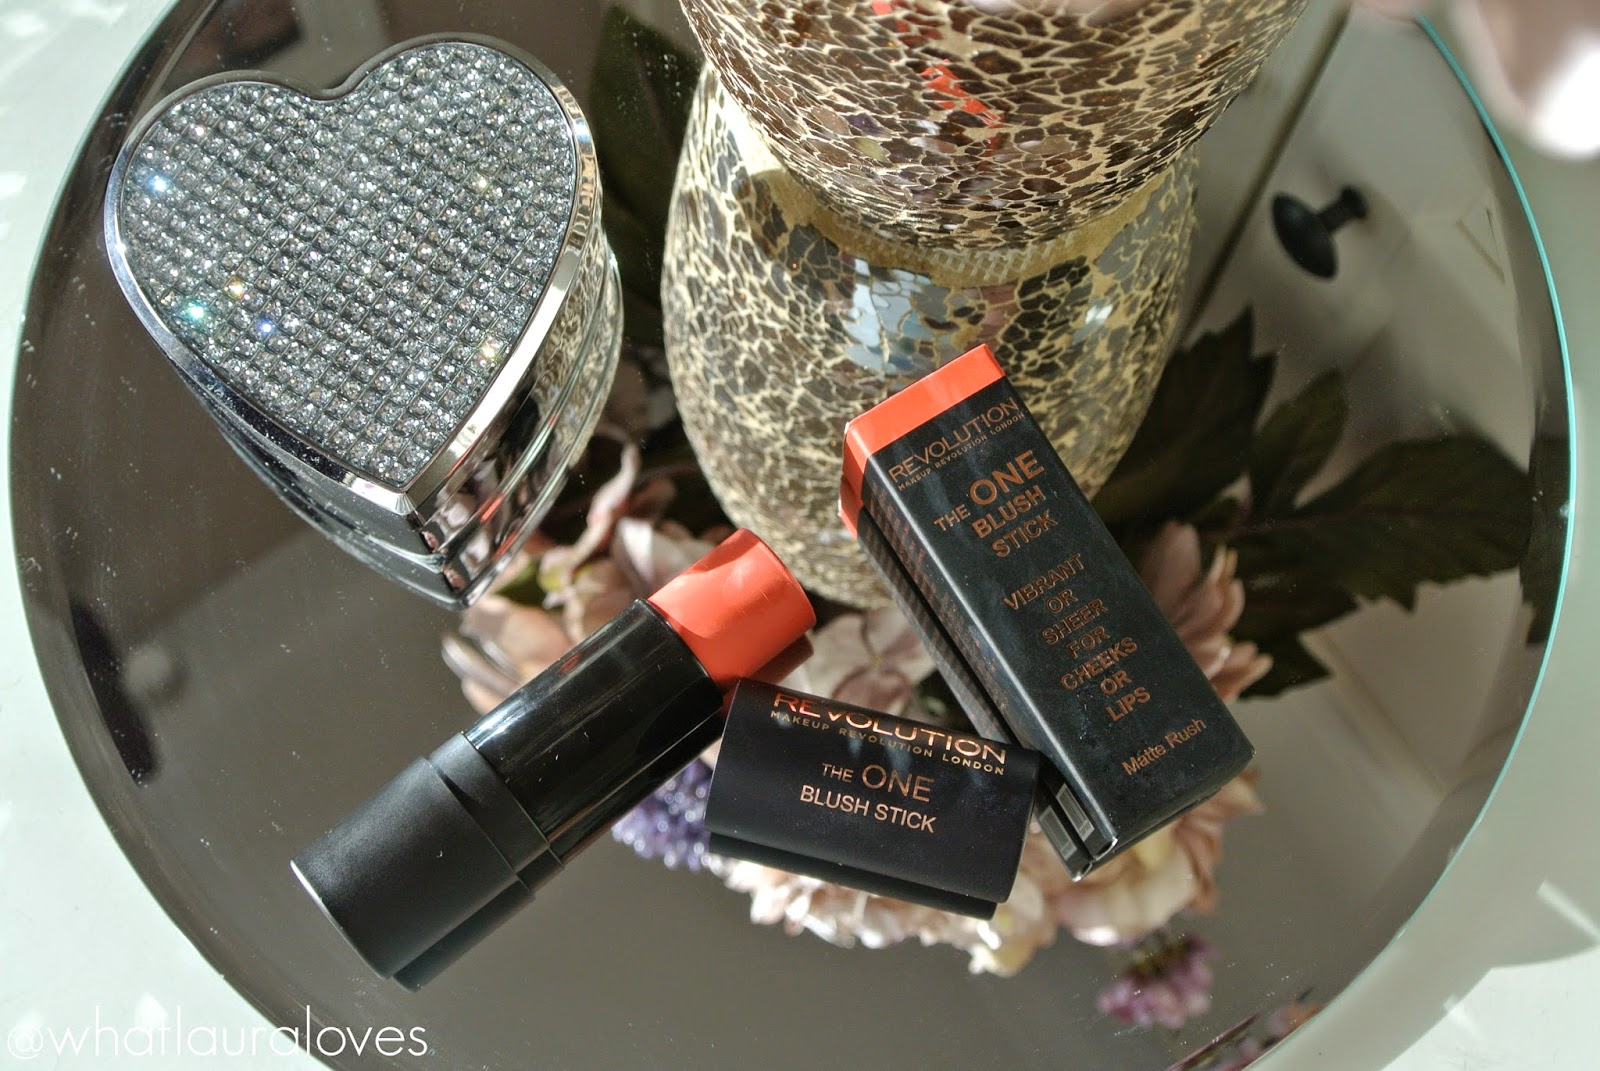 Makeup Revolution The One Blush Stick in Matte Rush